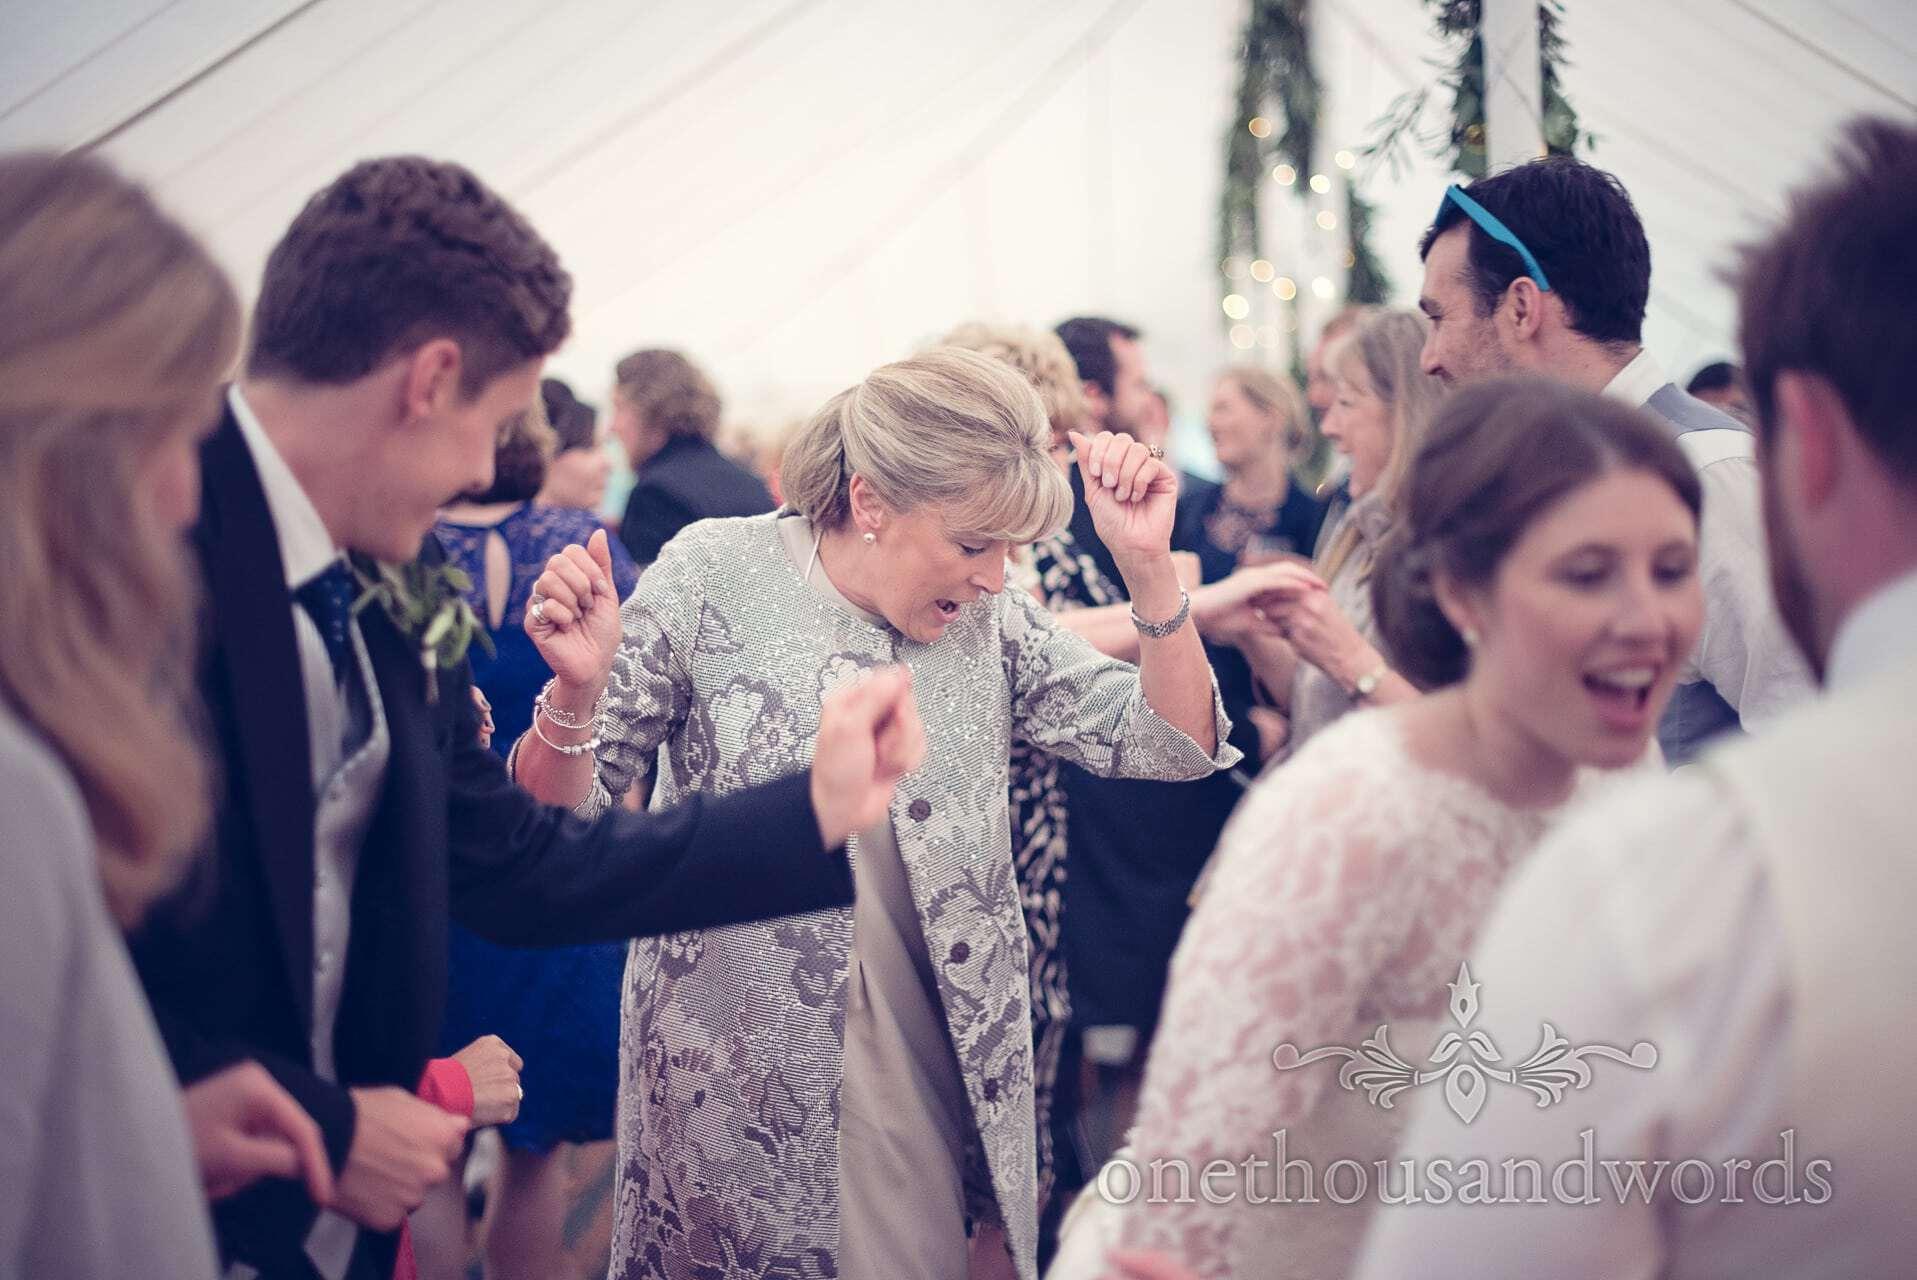 Mother of Bride dances at The Priory Wareham wedding